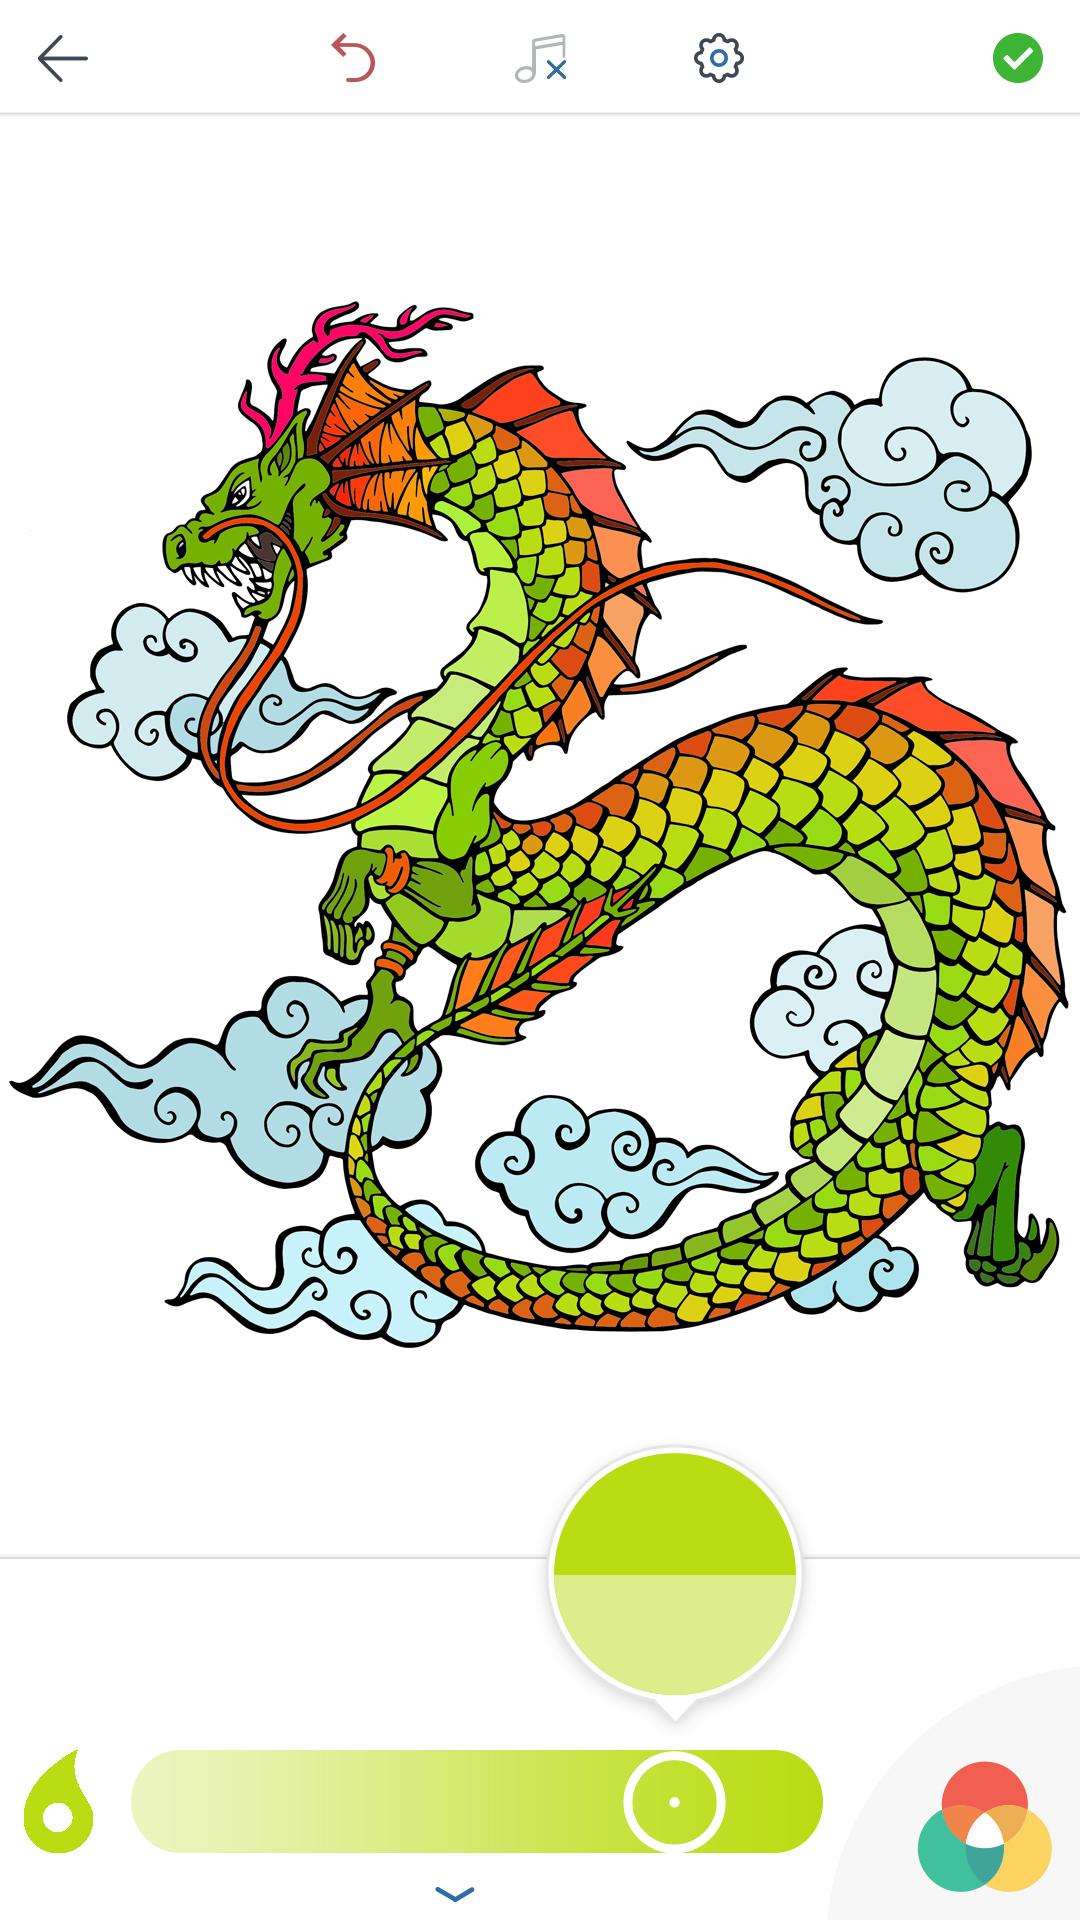 Desenhos Coreanos para Pintar para Adultos: Amazon.com.br